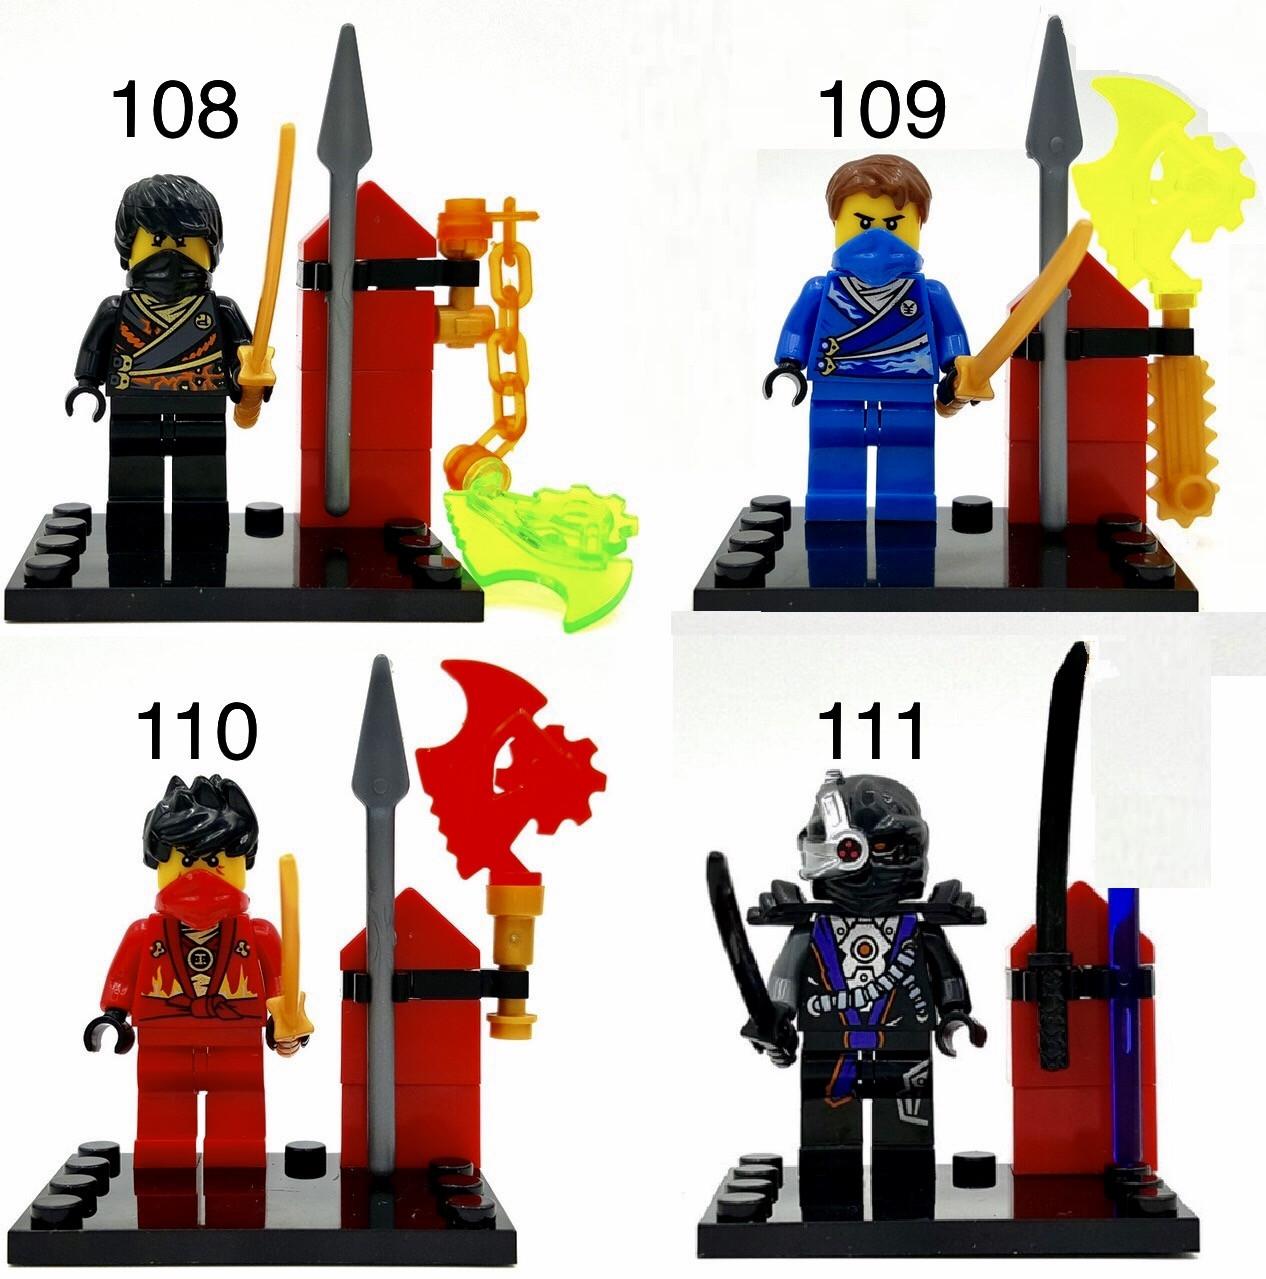 Новые Минифигурки ниндзяго ninjago Лего Lego Гармадон брелок фигурки дяпчики кай зейн ллойд Ниа Коул ниндроид